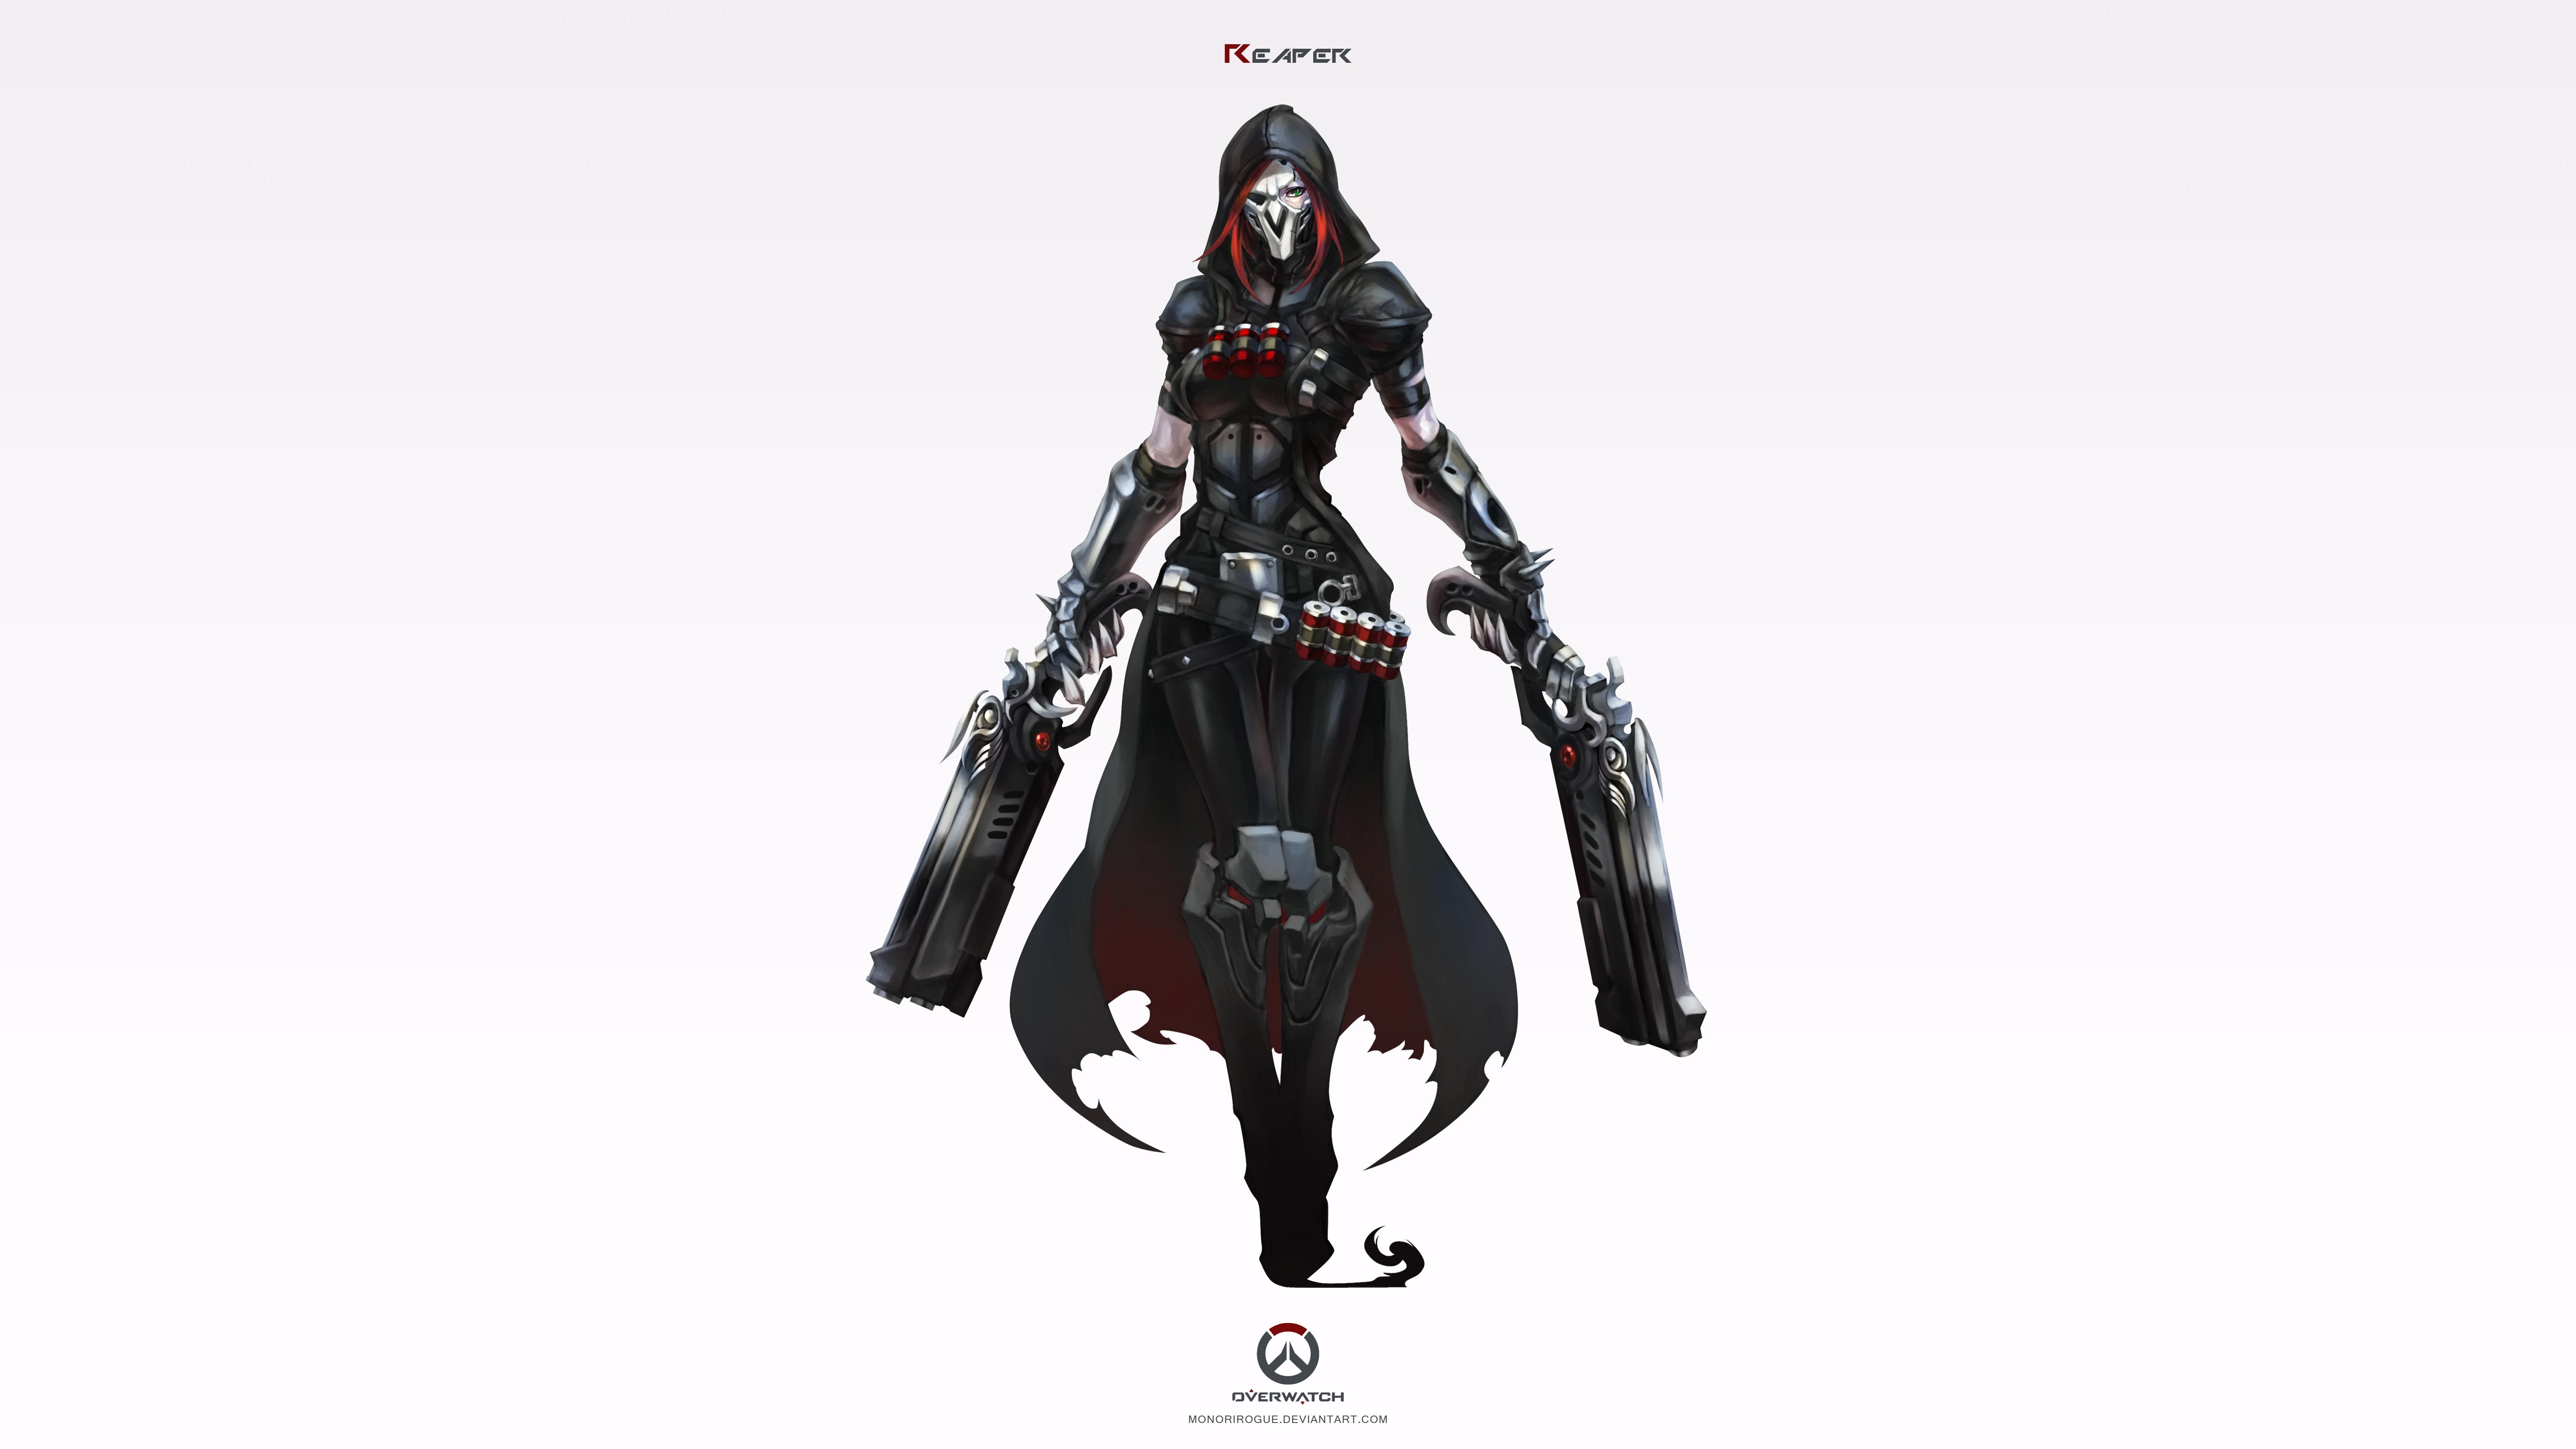 Overwatch OW Genji Cosplay Helmet Prop | Anime cosplay, Armour and ...